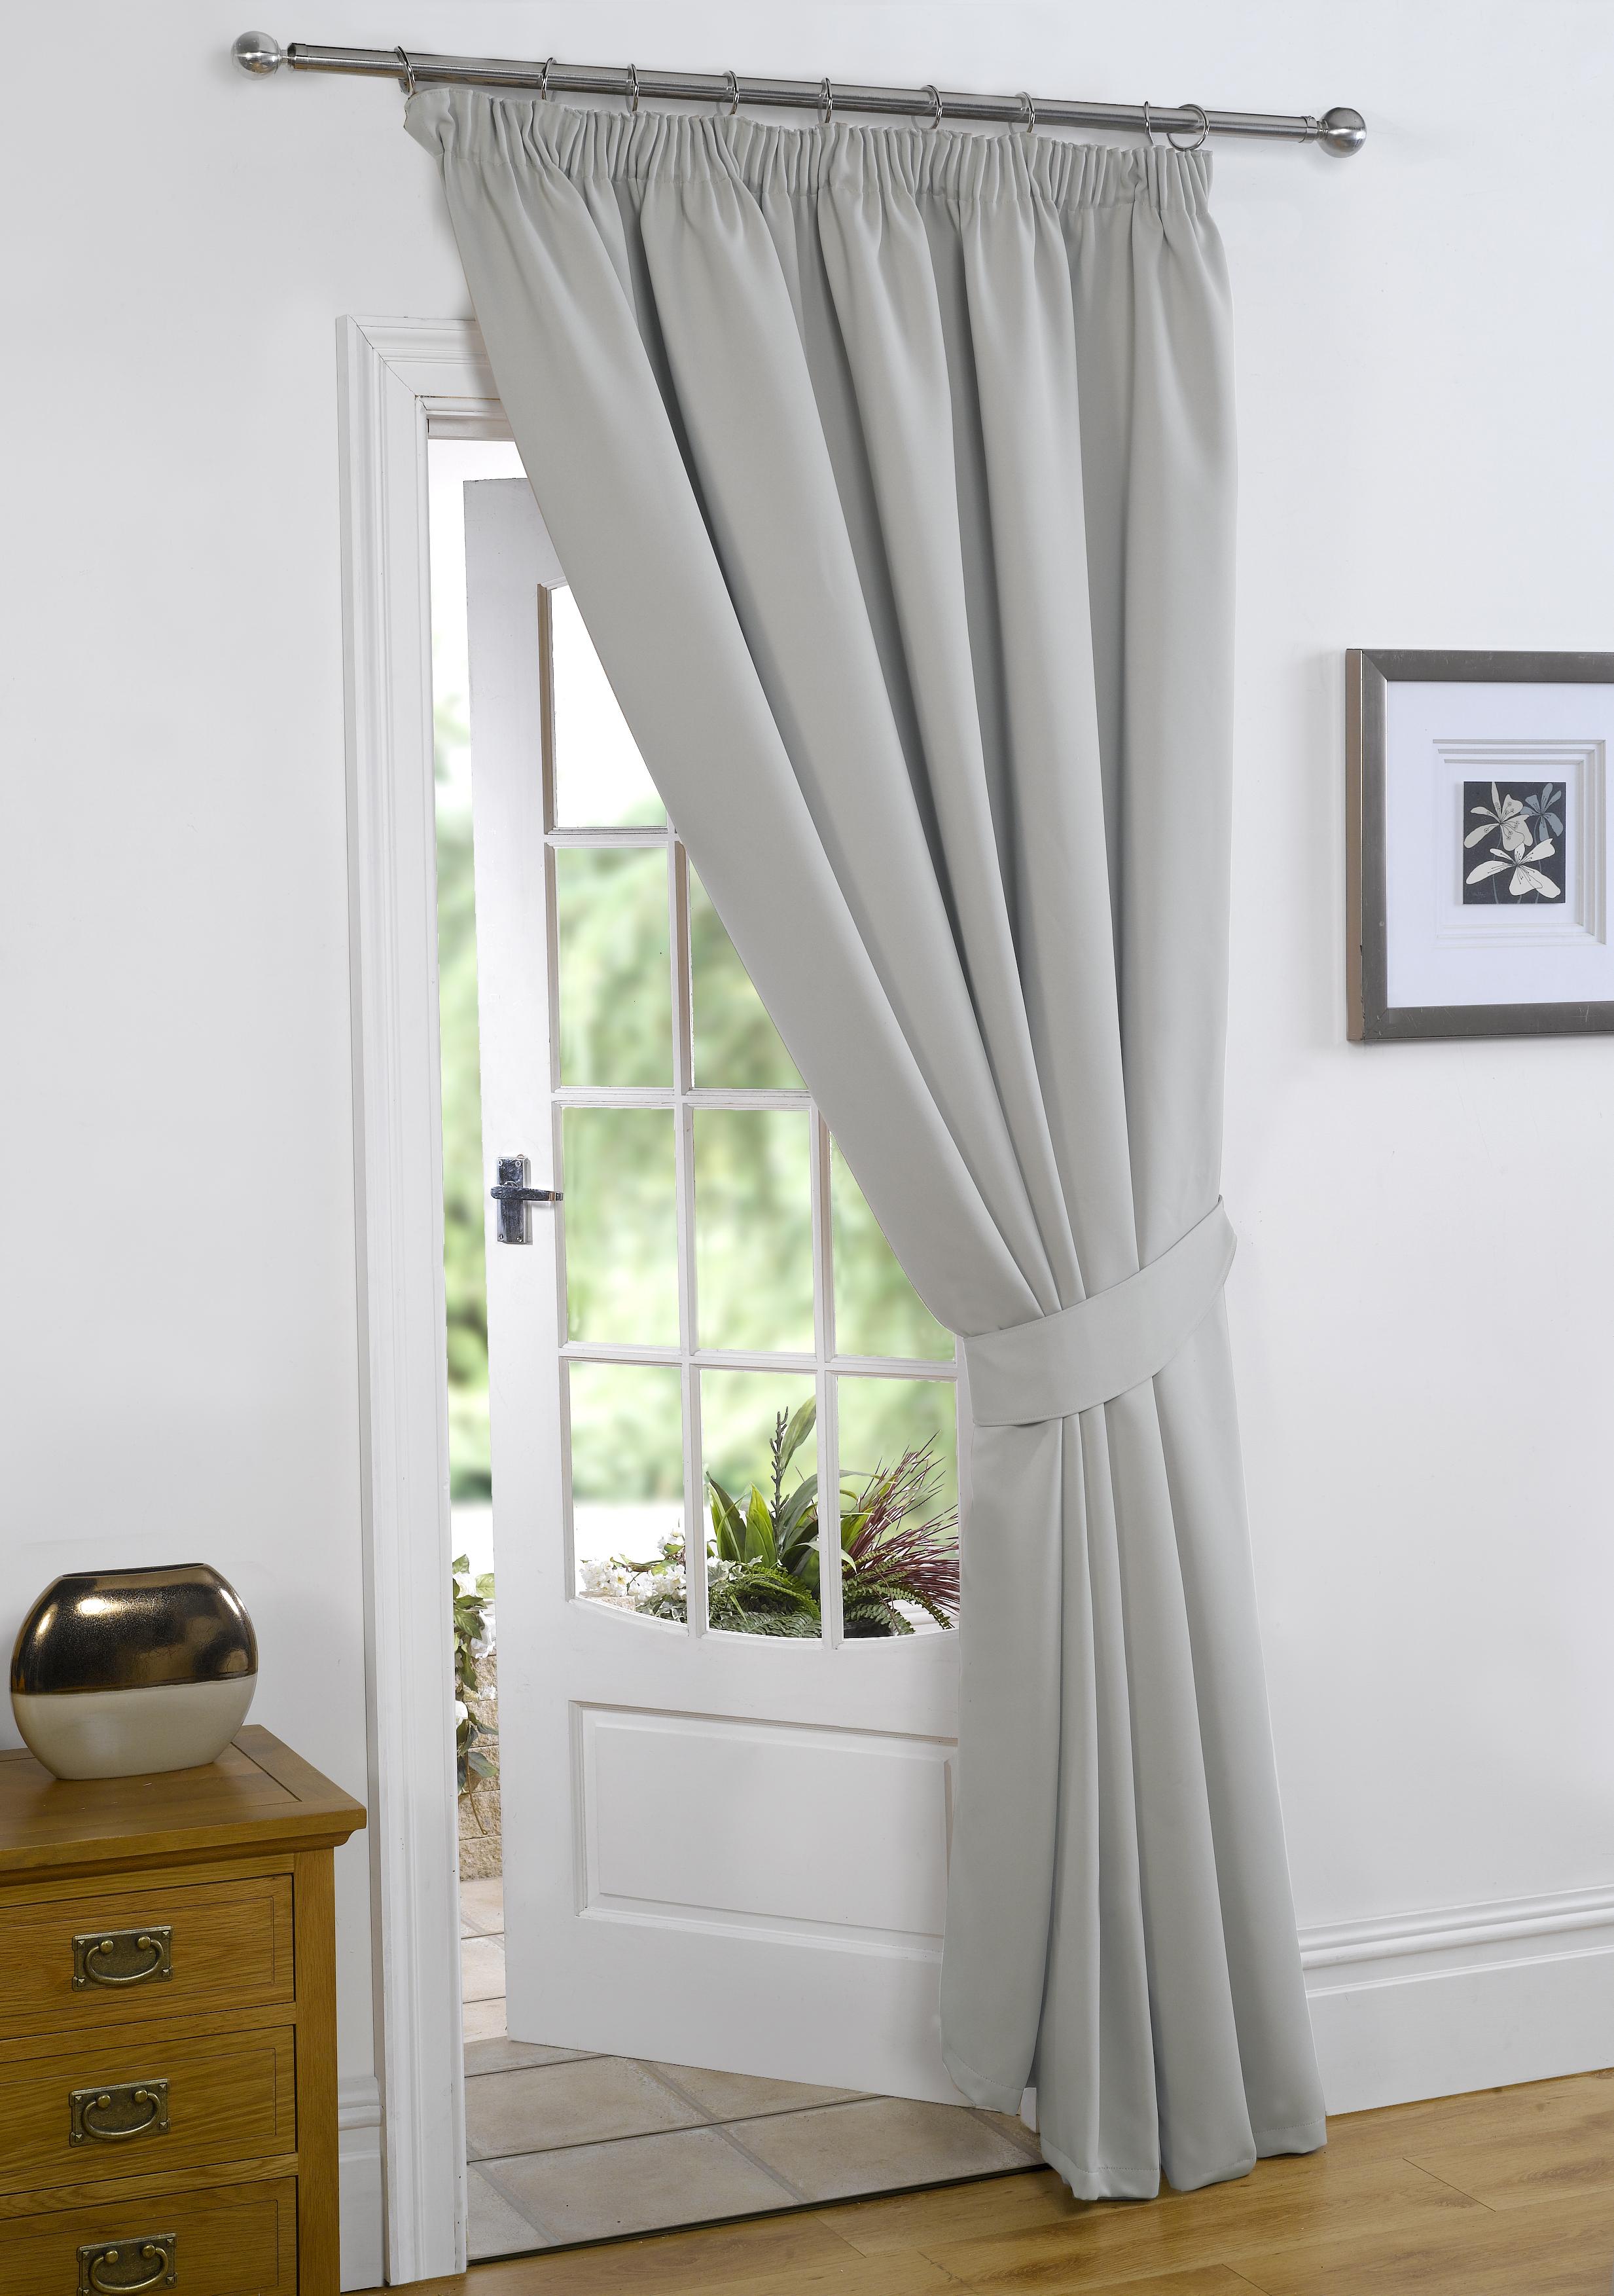 Curtain lengths standard